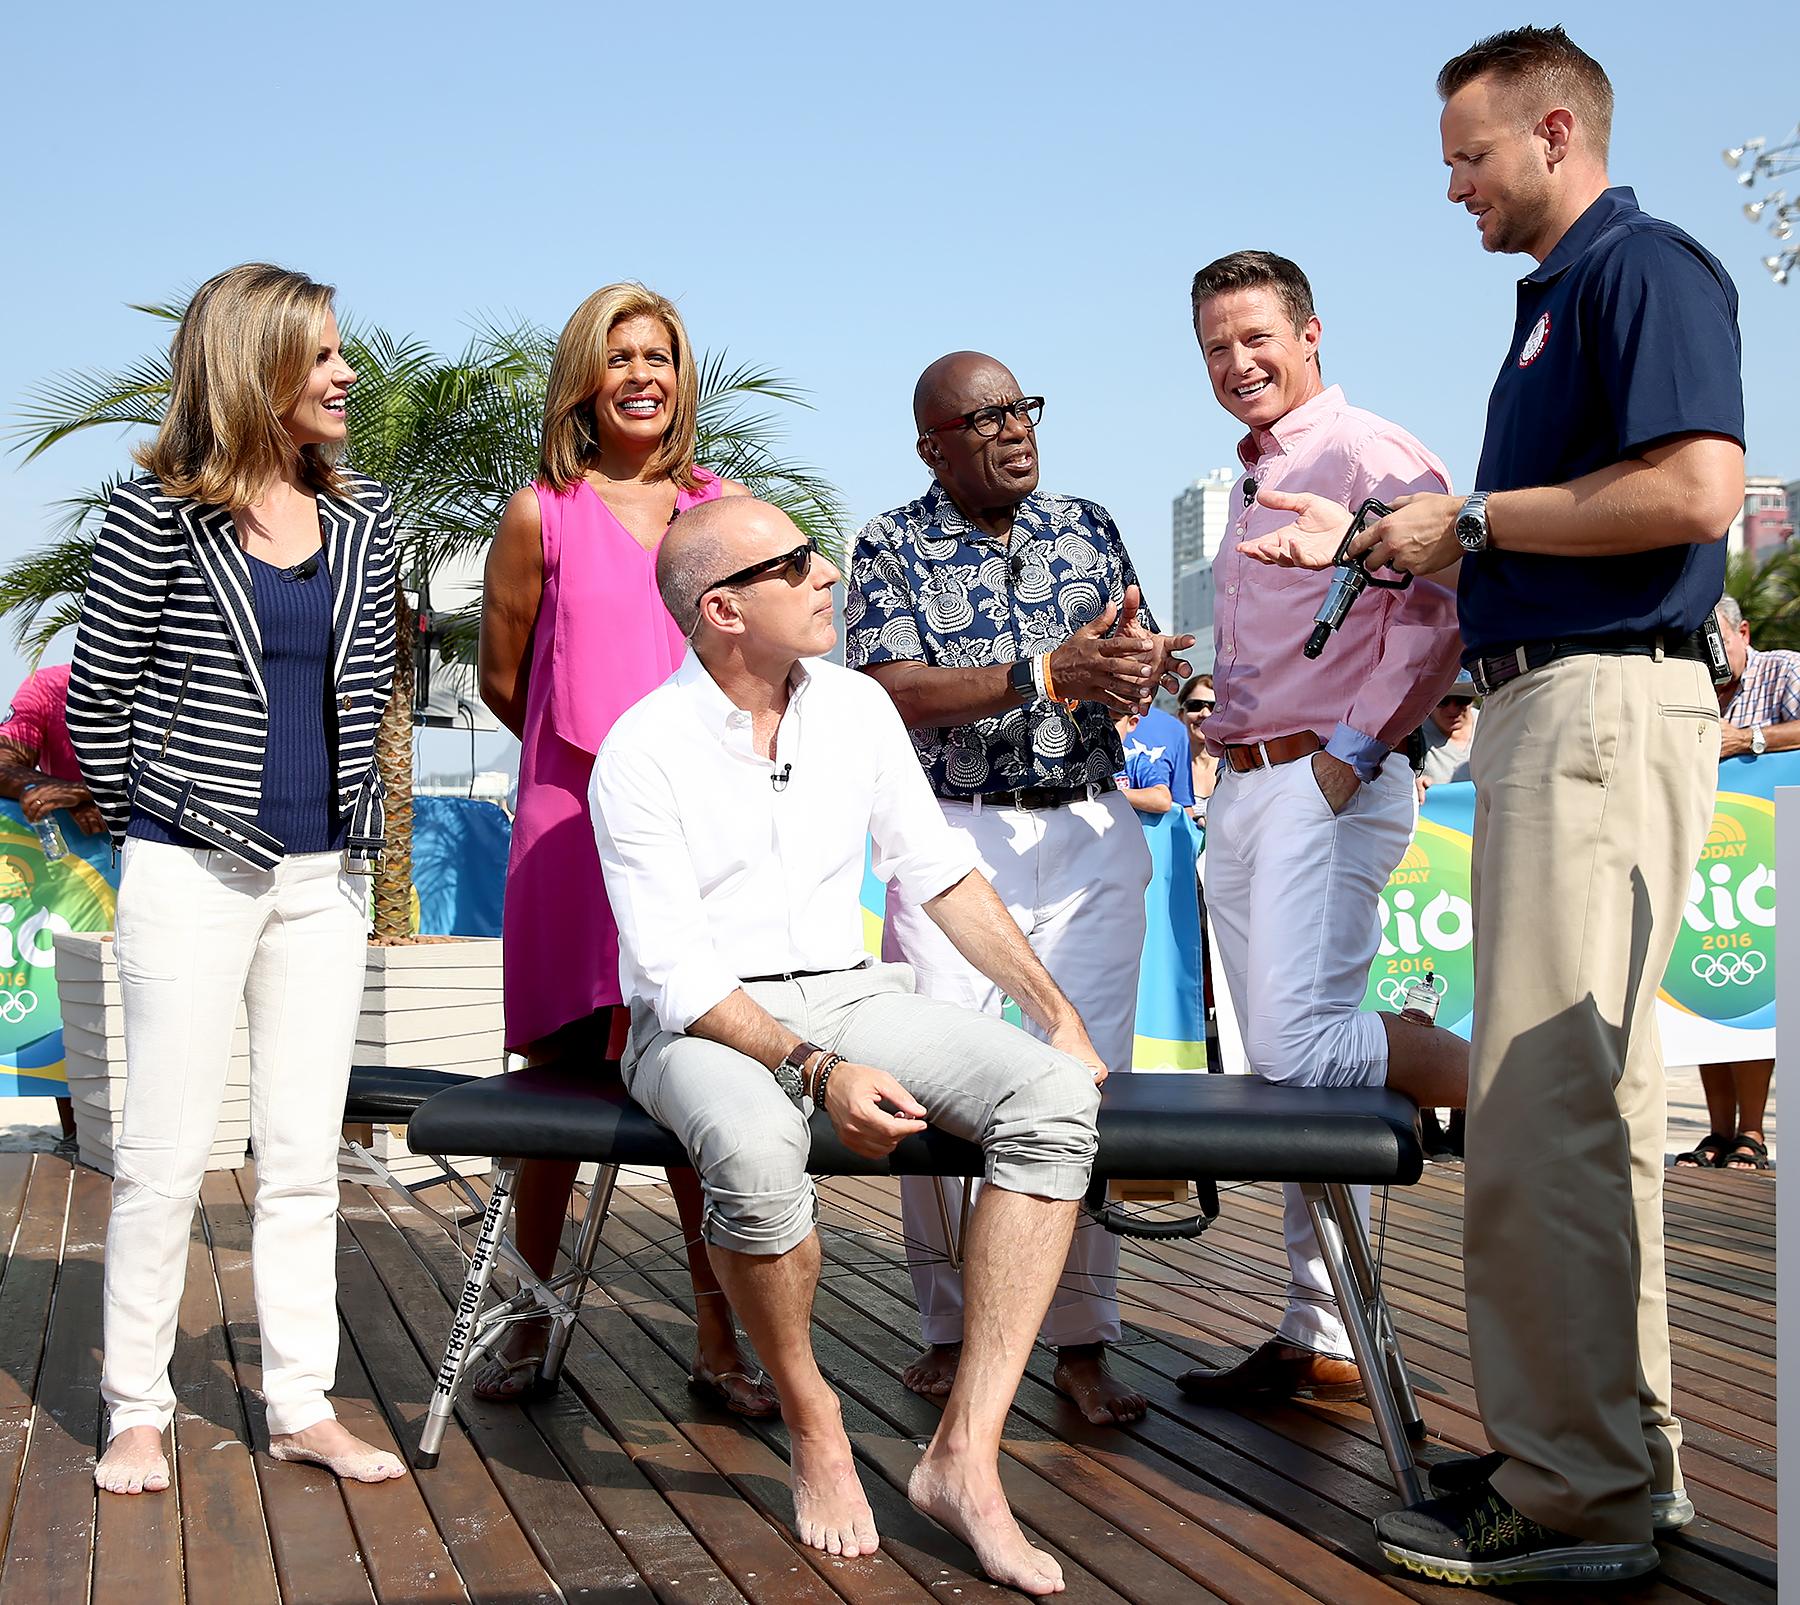 Natalie Morales, Hoda Kotb, Matt Lauer, Al Roker and Billy Bush with US team doctor Kevin Pierce appear on NBC's